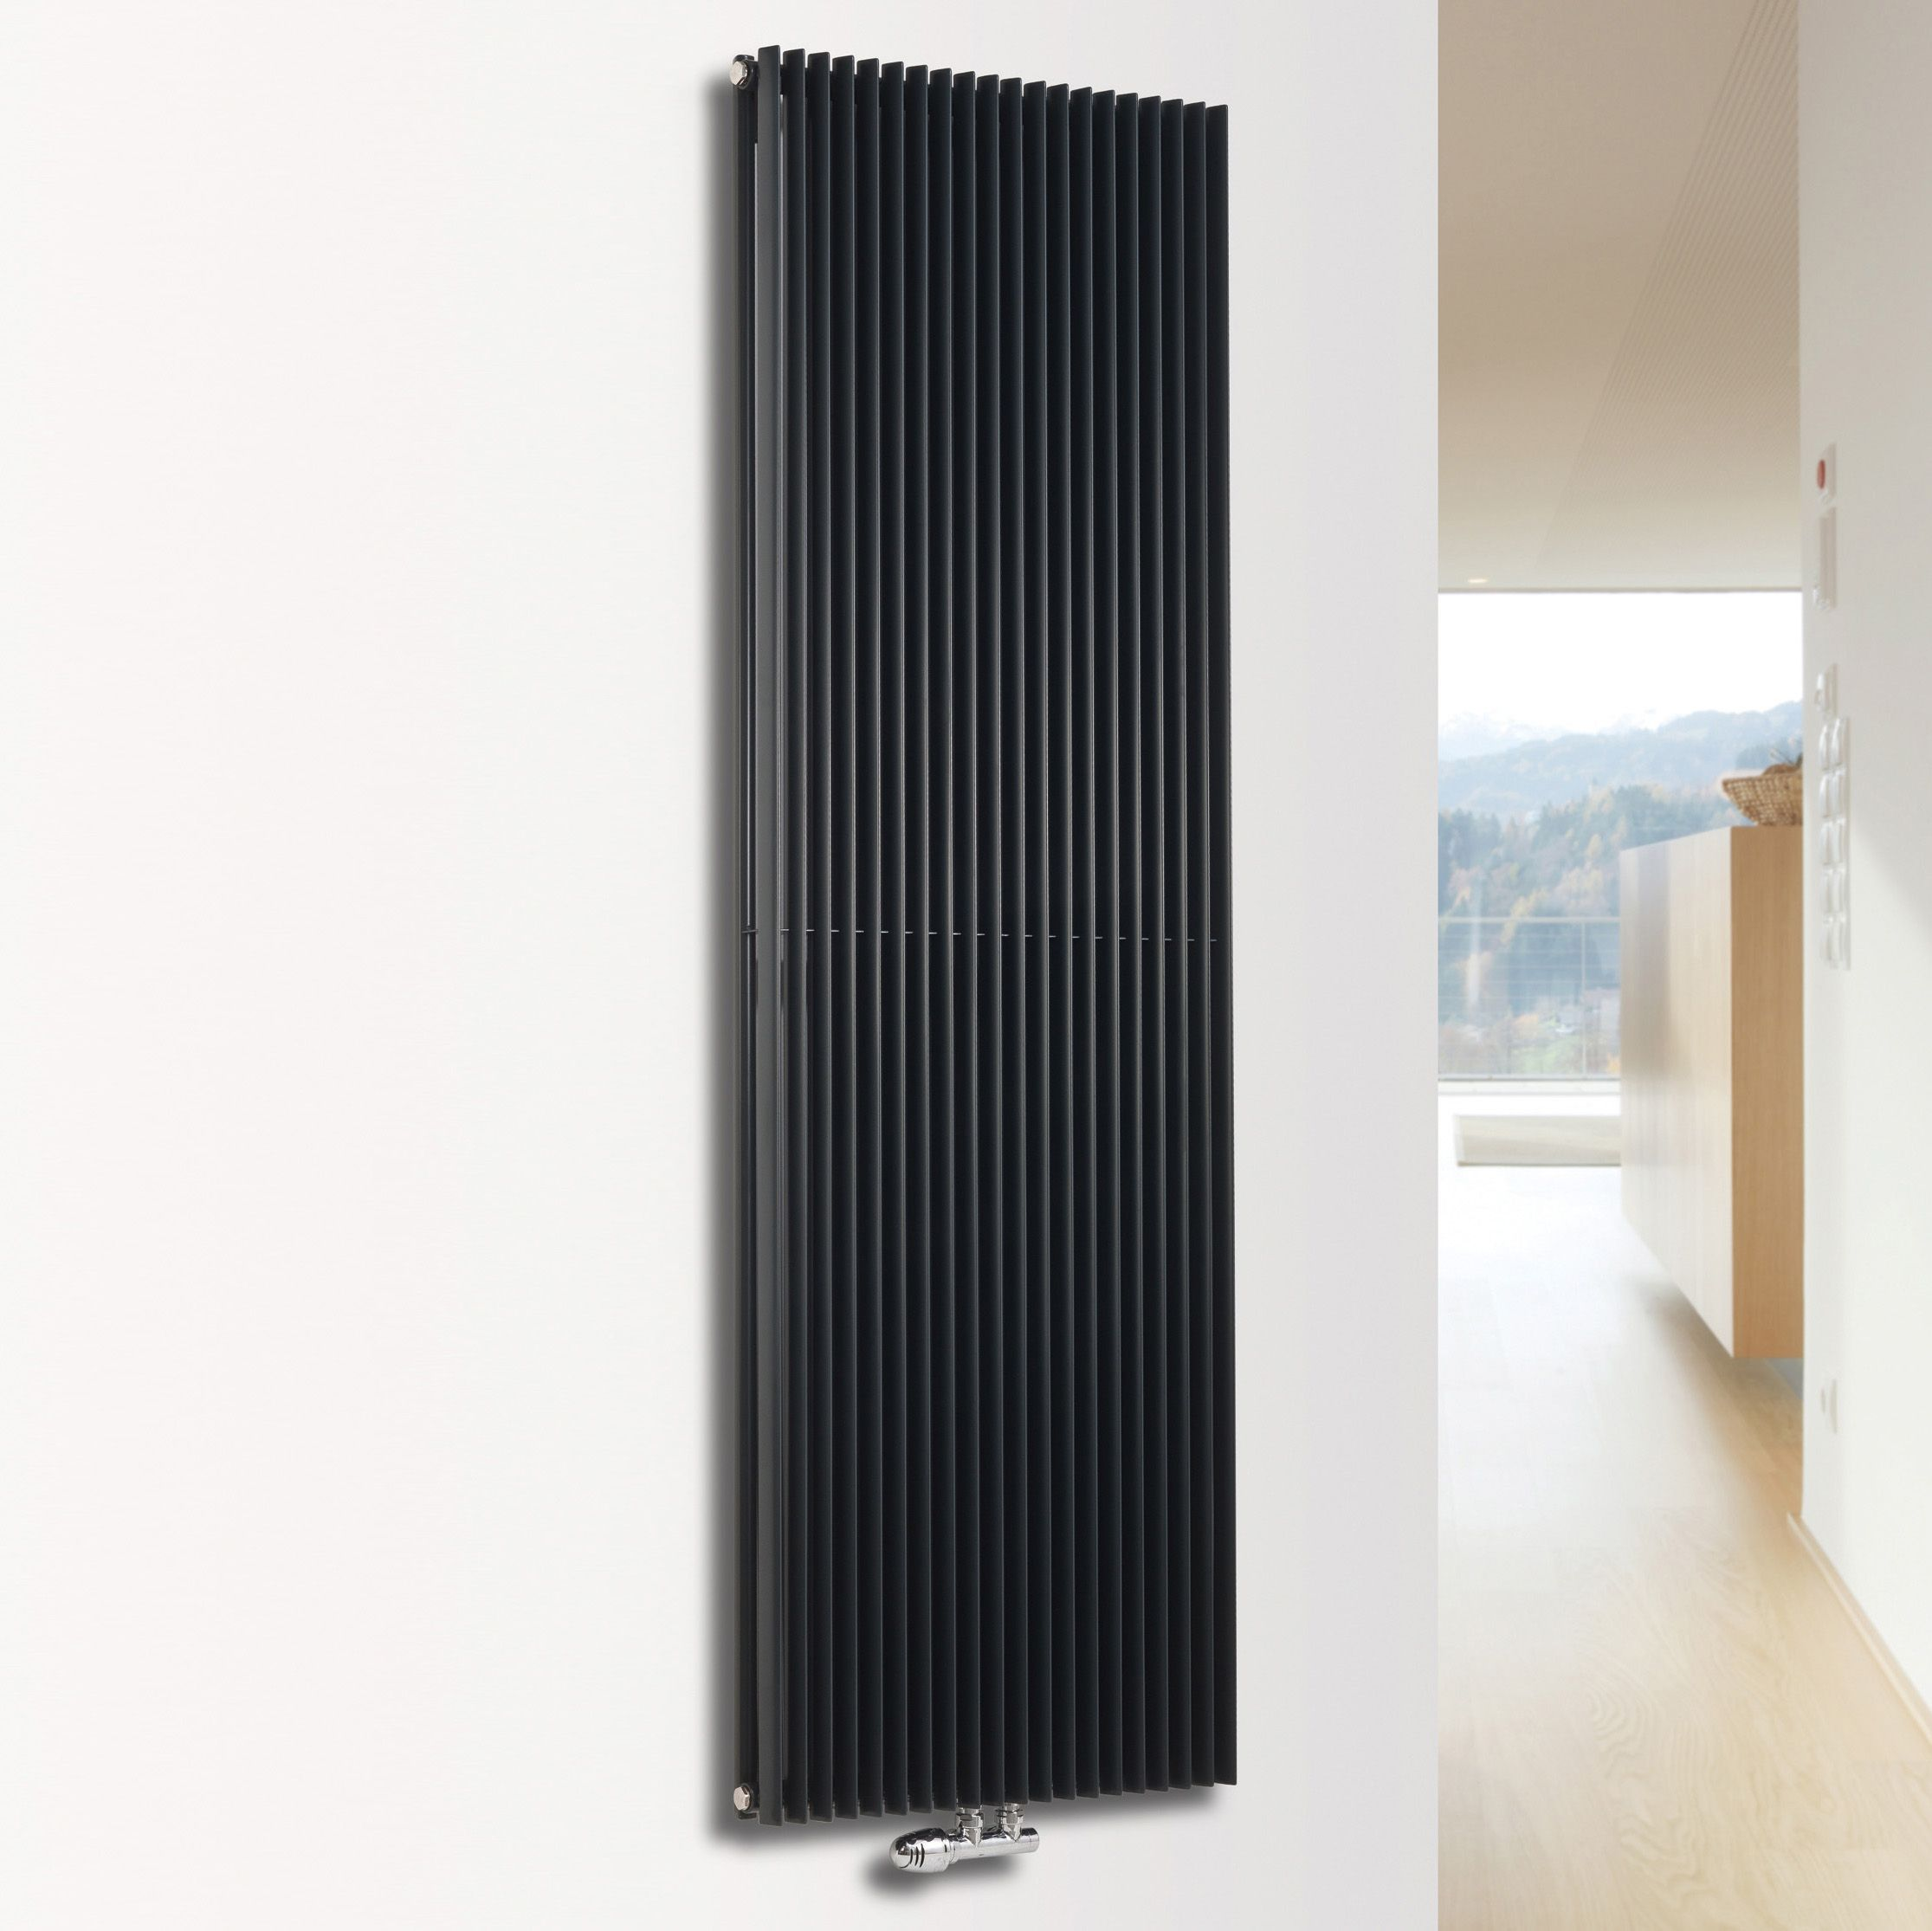 Ximax Triton Duplex Vertical Radiator Anthracite (H)1800 mm